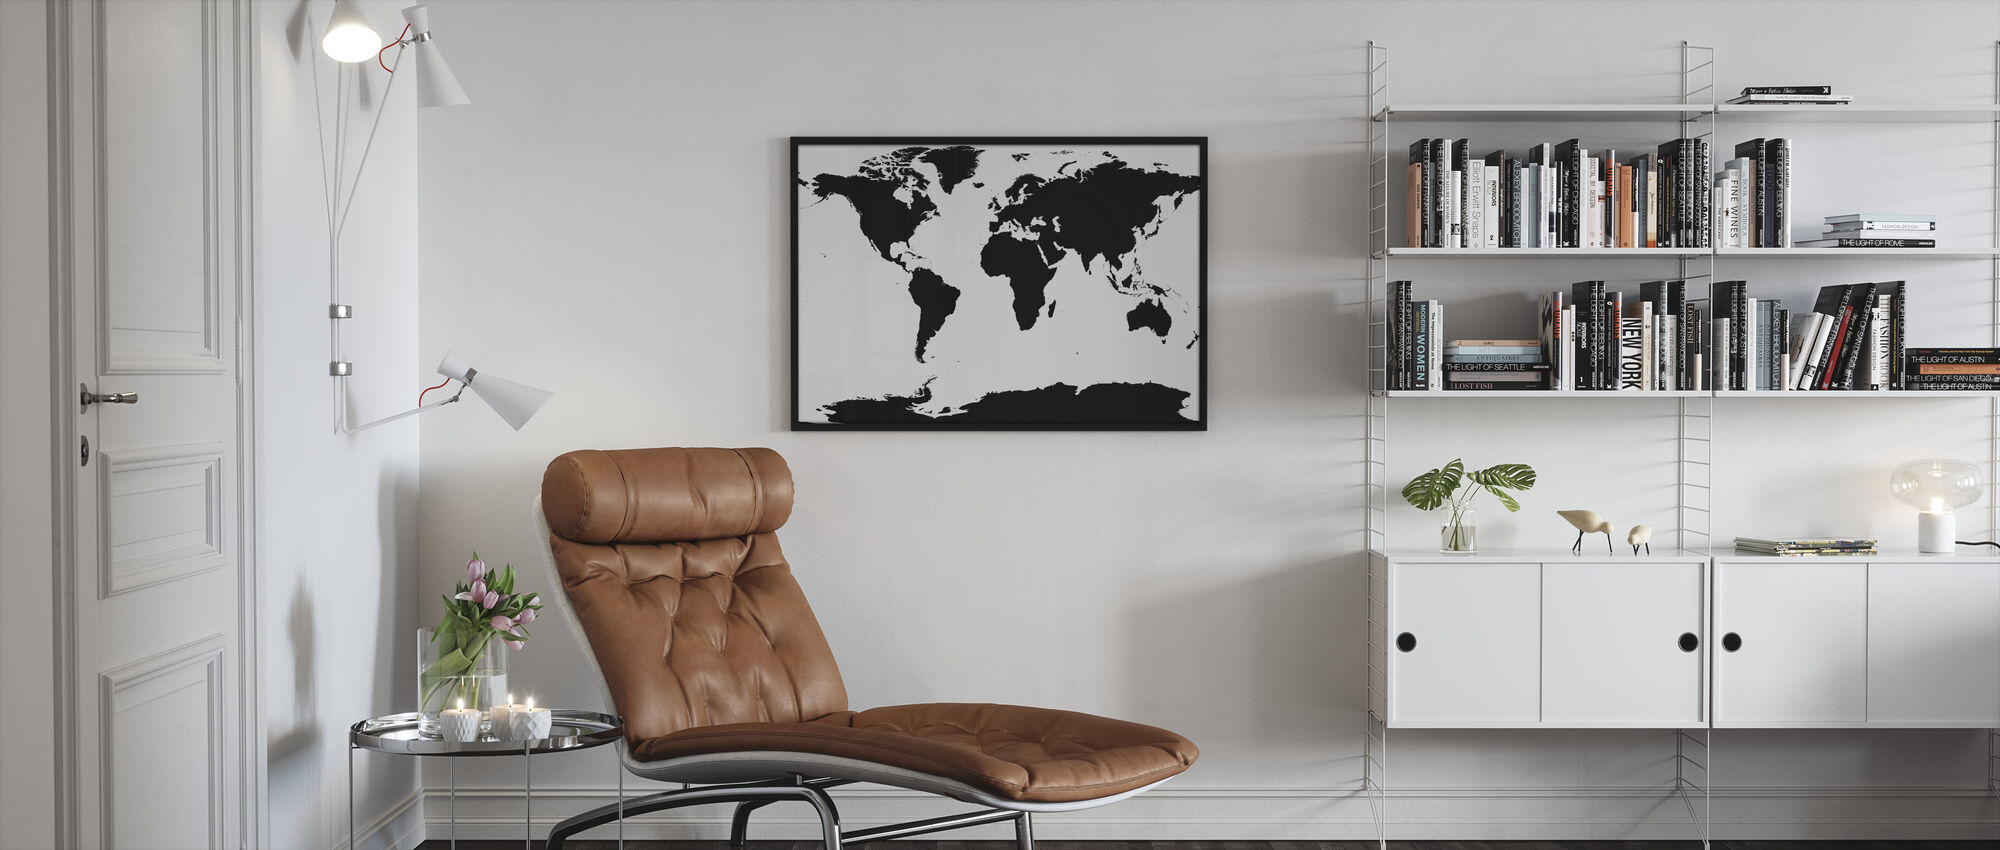 Världskarta - Inramad tavla - Vardagsrum